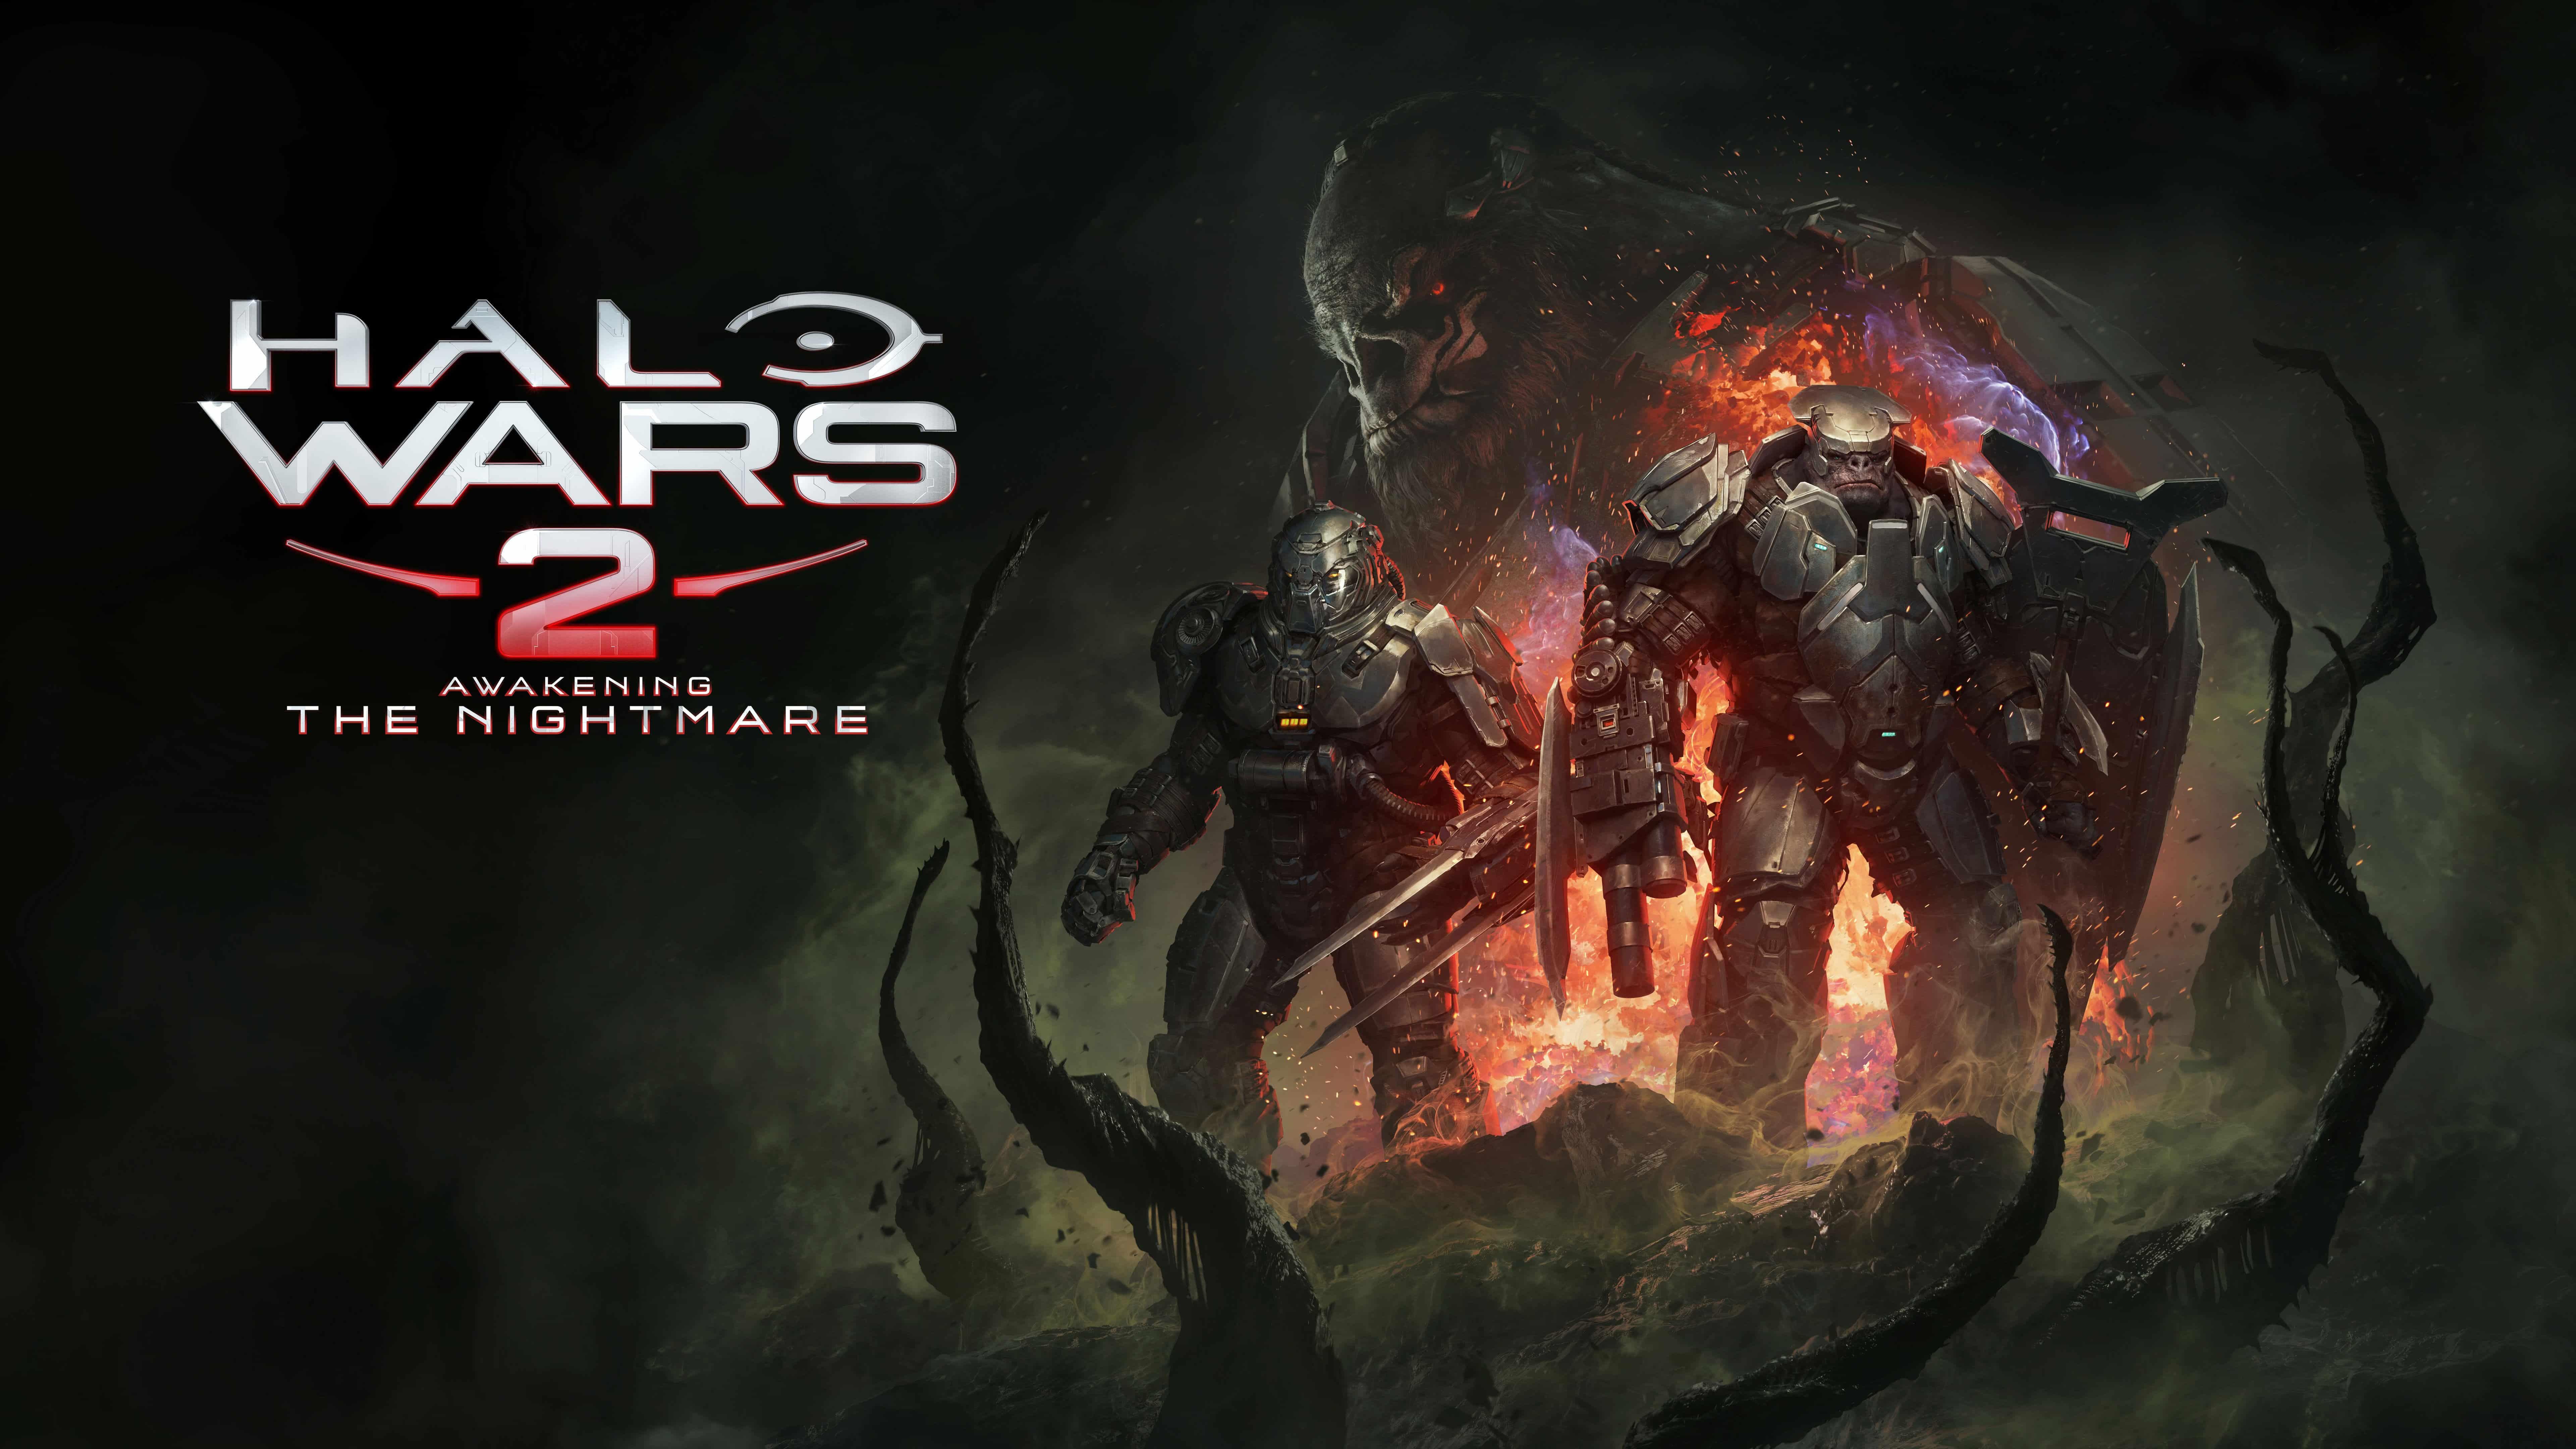 Halo Wars 2 Awakening The Nightmare Uhd 8k Wallpaper Pixelz